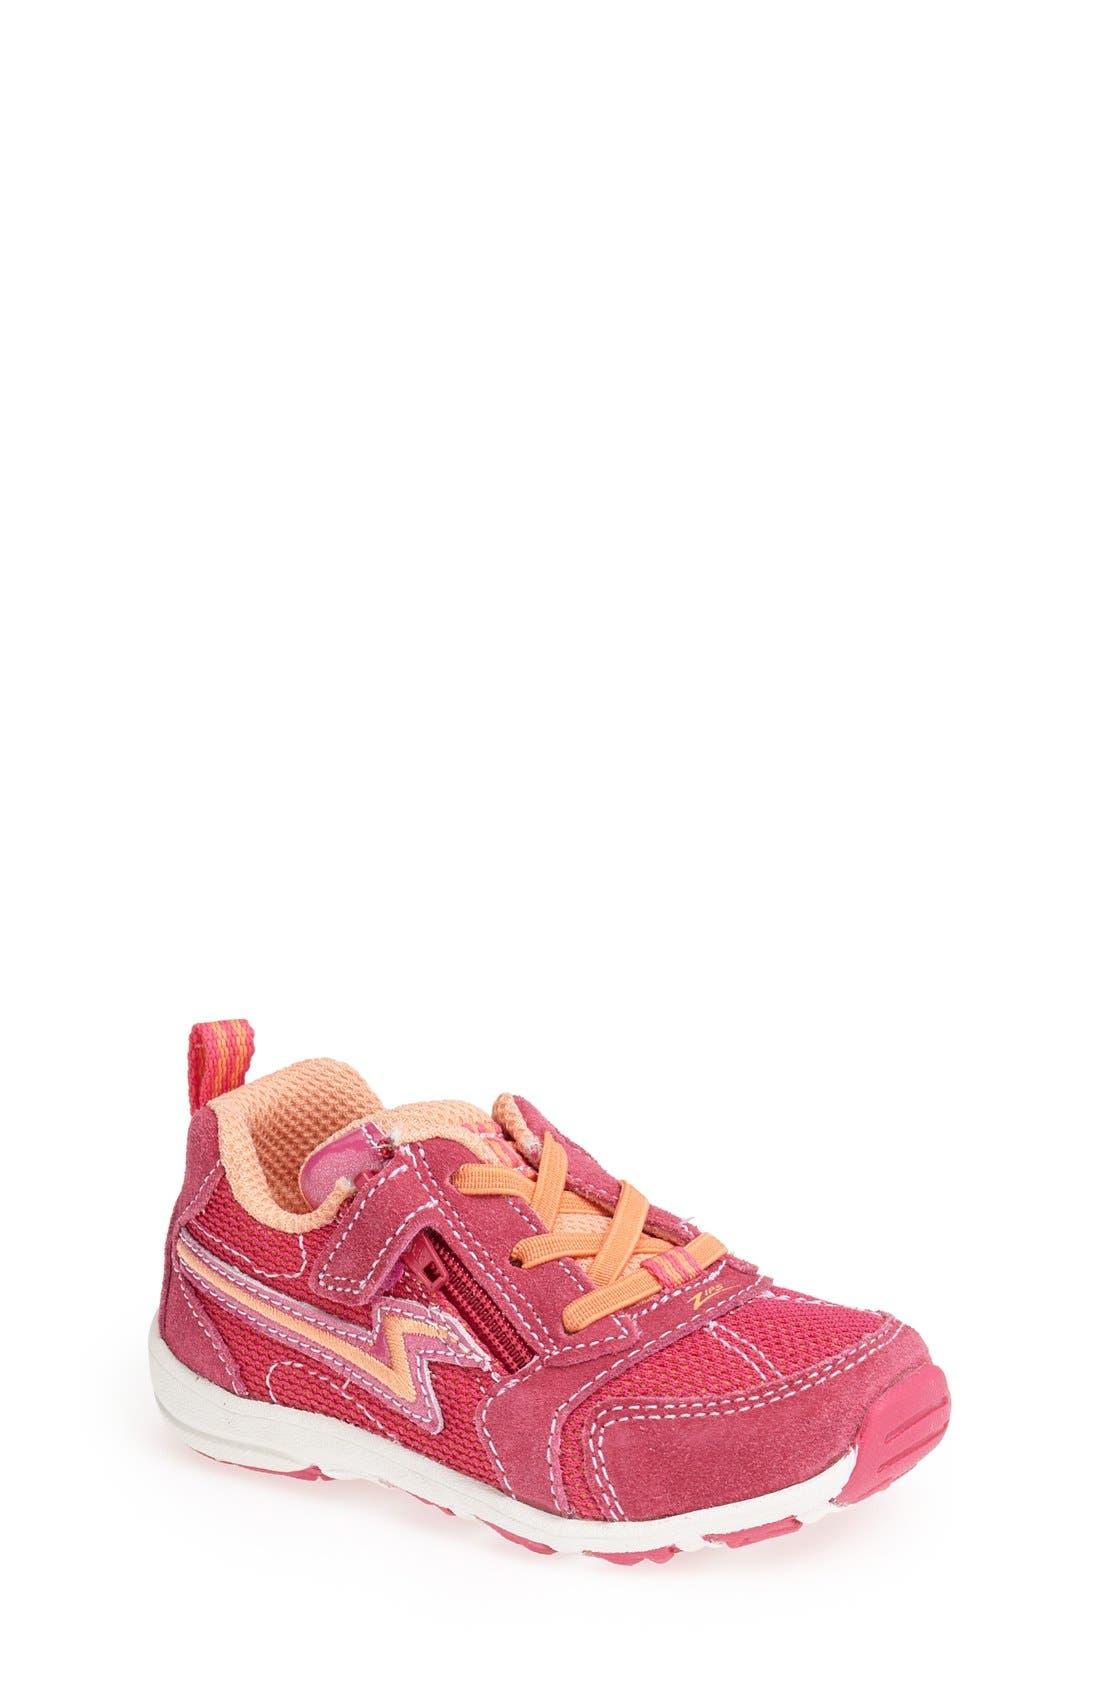 Main Image - Stride Rite 'Zips' Sneaker (Walker & Toddler)